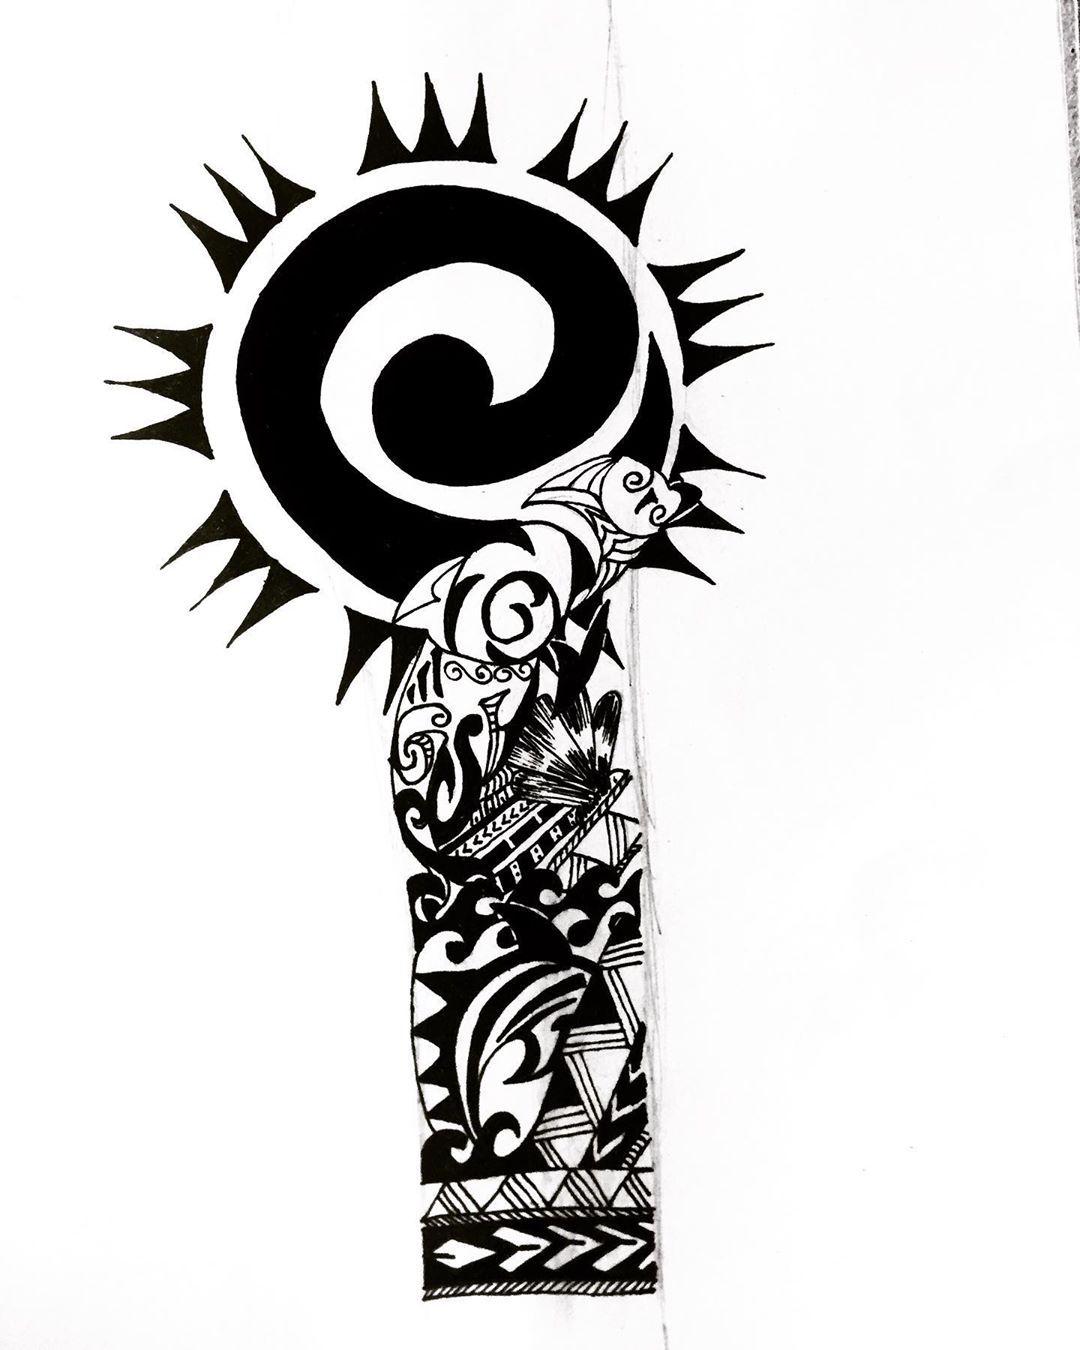 "X on Instagram: ""I could be your tattoo designer All you gotta do is dm 😉 . #tattooideas #sleevetattoo #polynesiantattoo #oceantattoos #mandalatattoo…"""